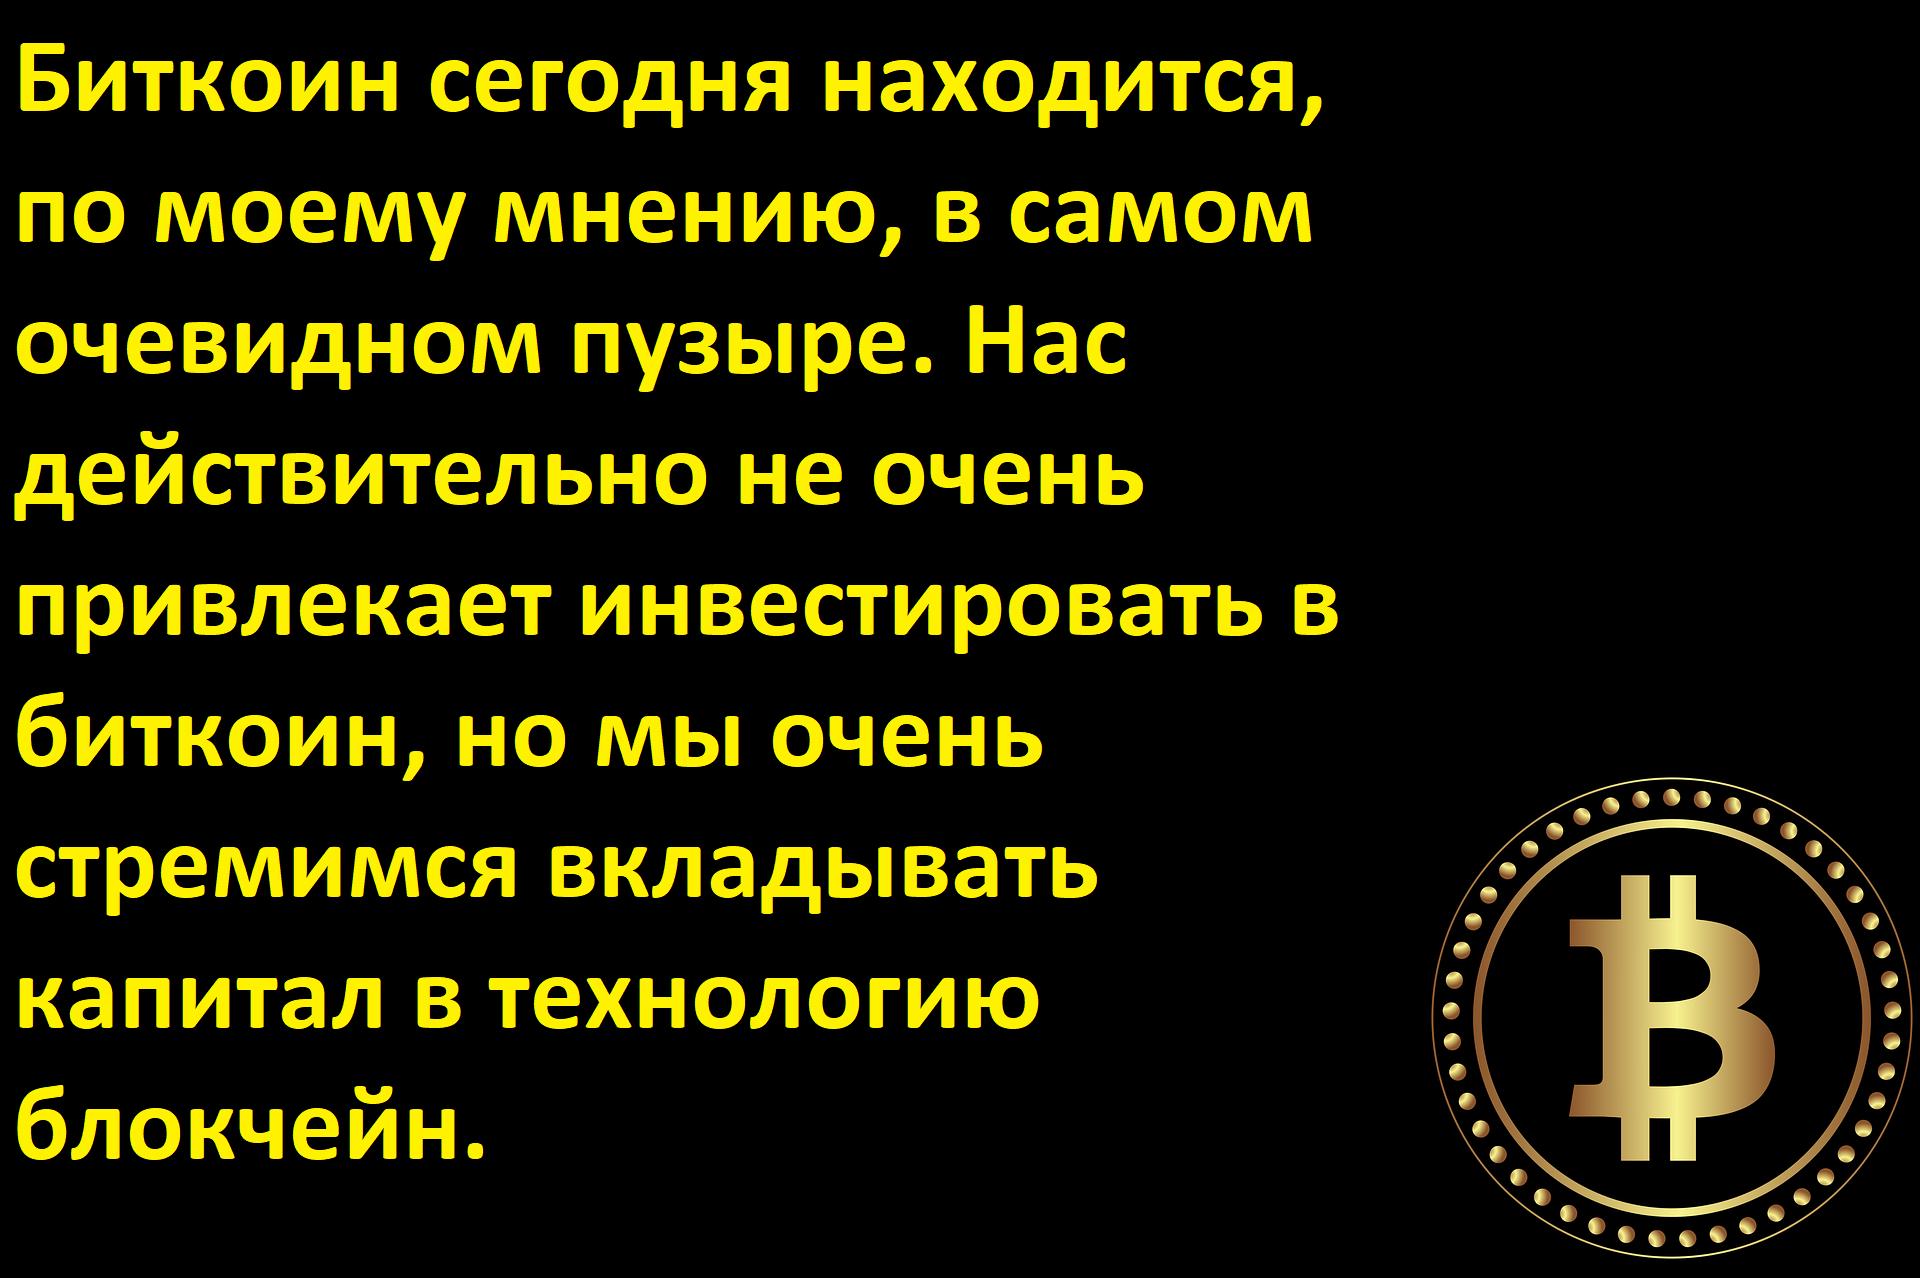 bitcoin-2670336_960_720.png